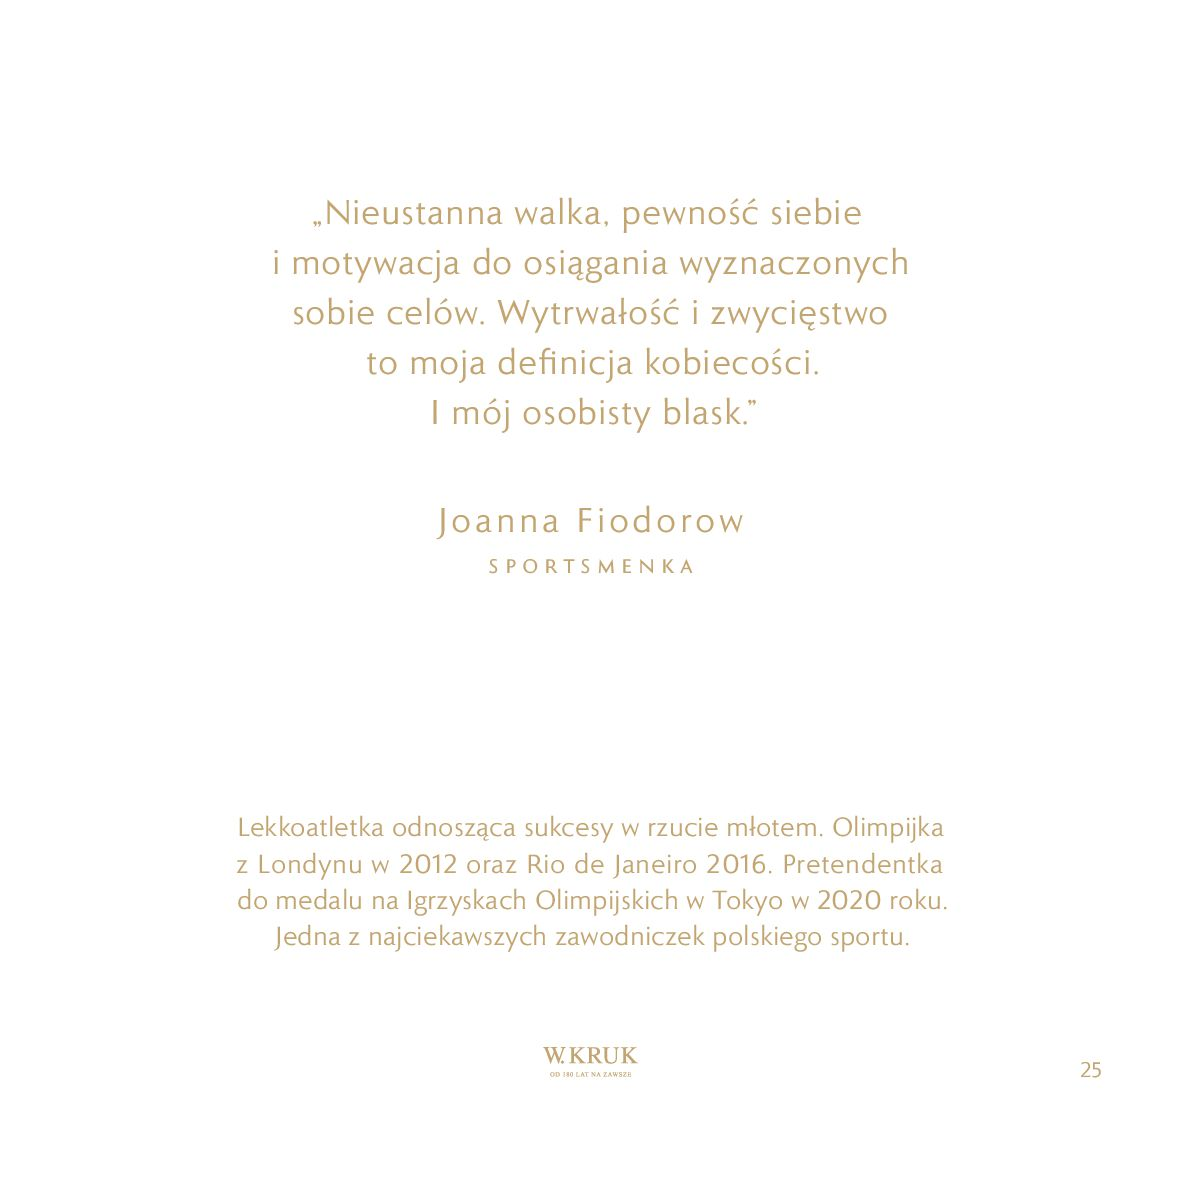 Gazetka W. KRUK: Katalog - Kolekcja Blask 2021-02-17 page-26